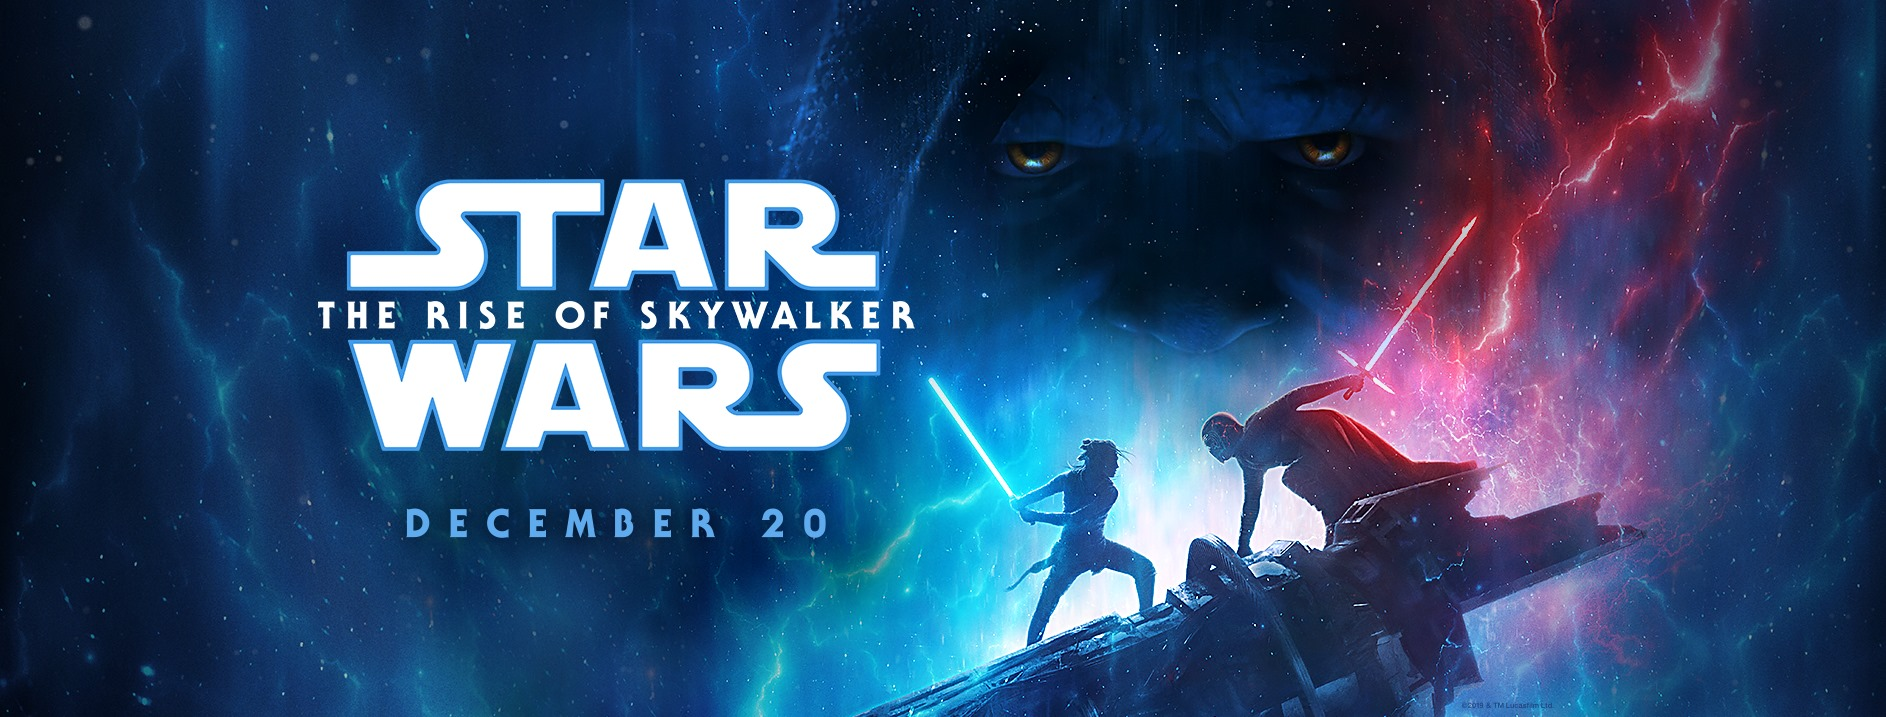 Star-Wars-Rise-of-Skywalker-Key-Art-Horizontal